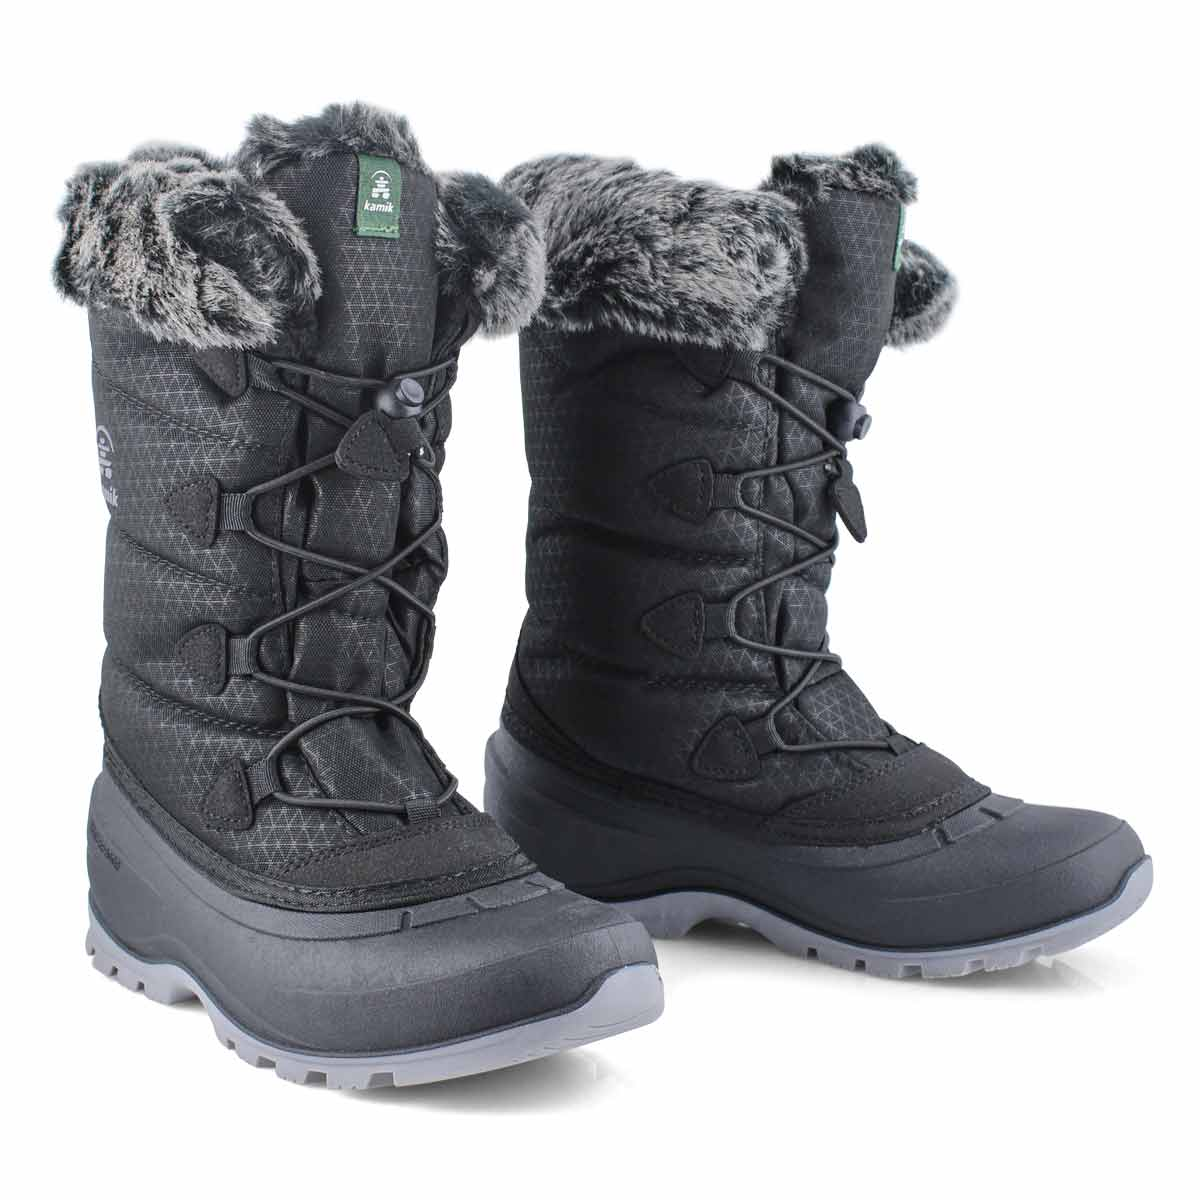 Lds Momentum 2 black wtpf winter boot